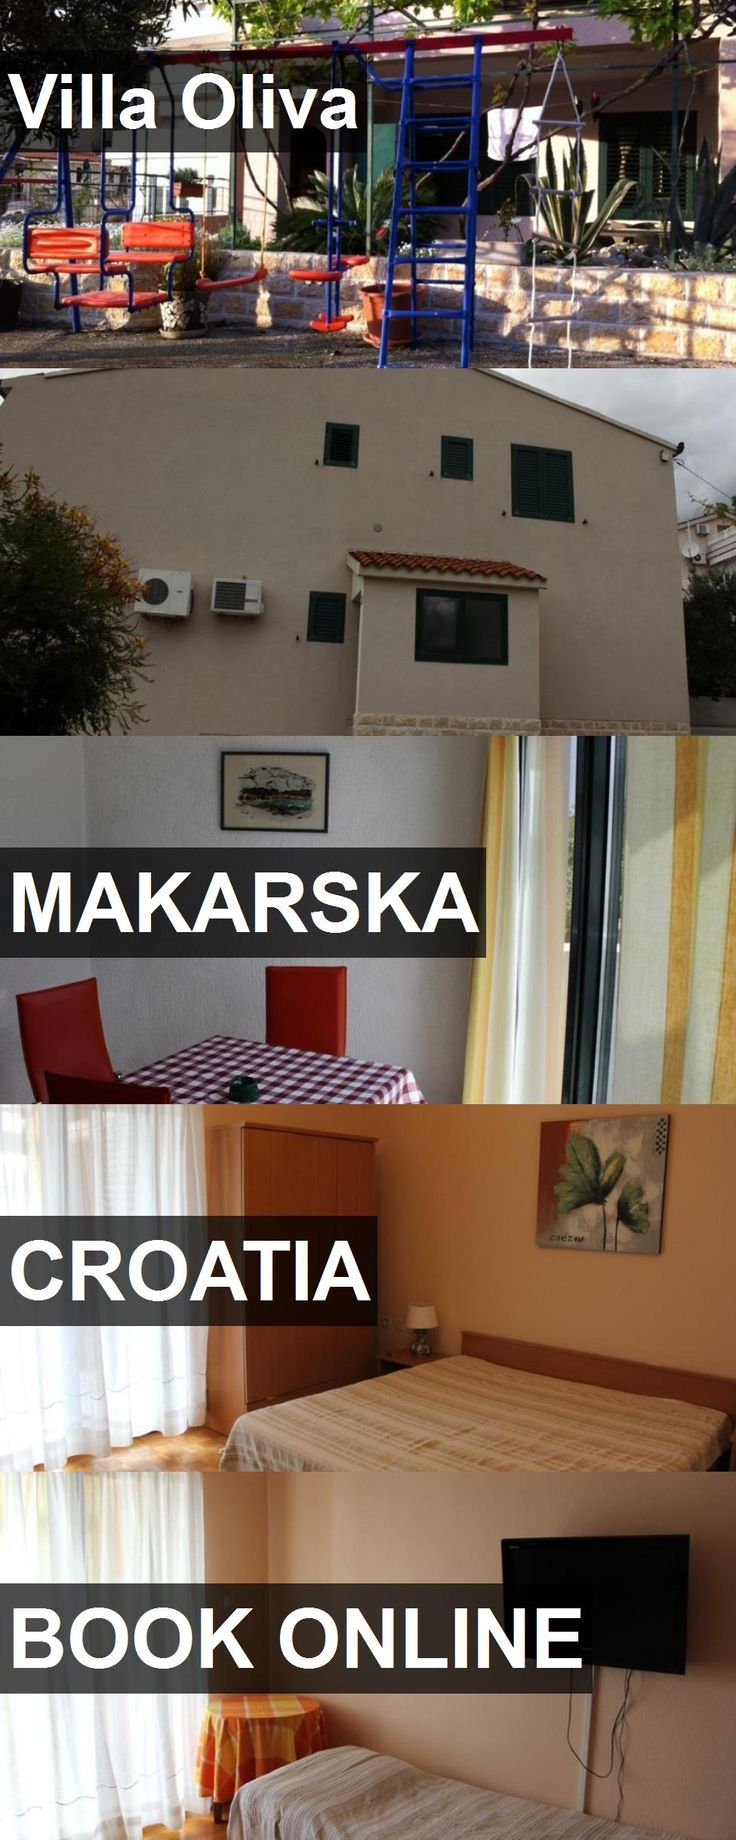 Hotel Villa Oliva in Makarska, Croatia. For more information, photos, reviews and best prices please follow the link. #Croatia #Makarska #travel #vacation #hotel